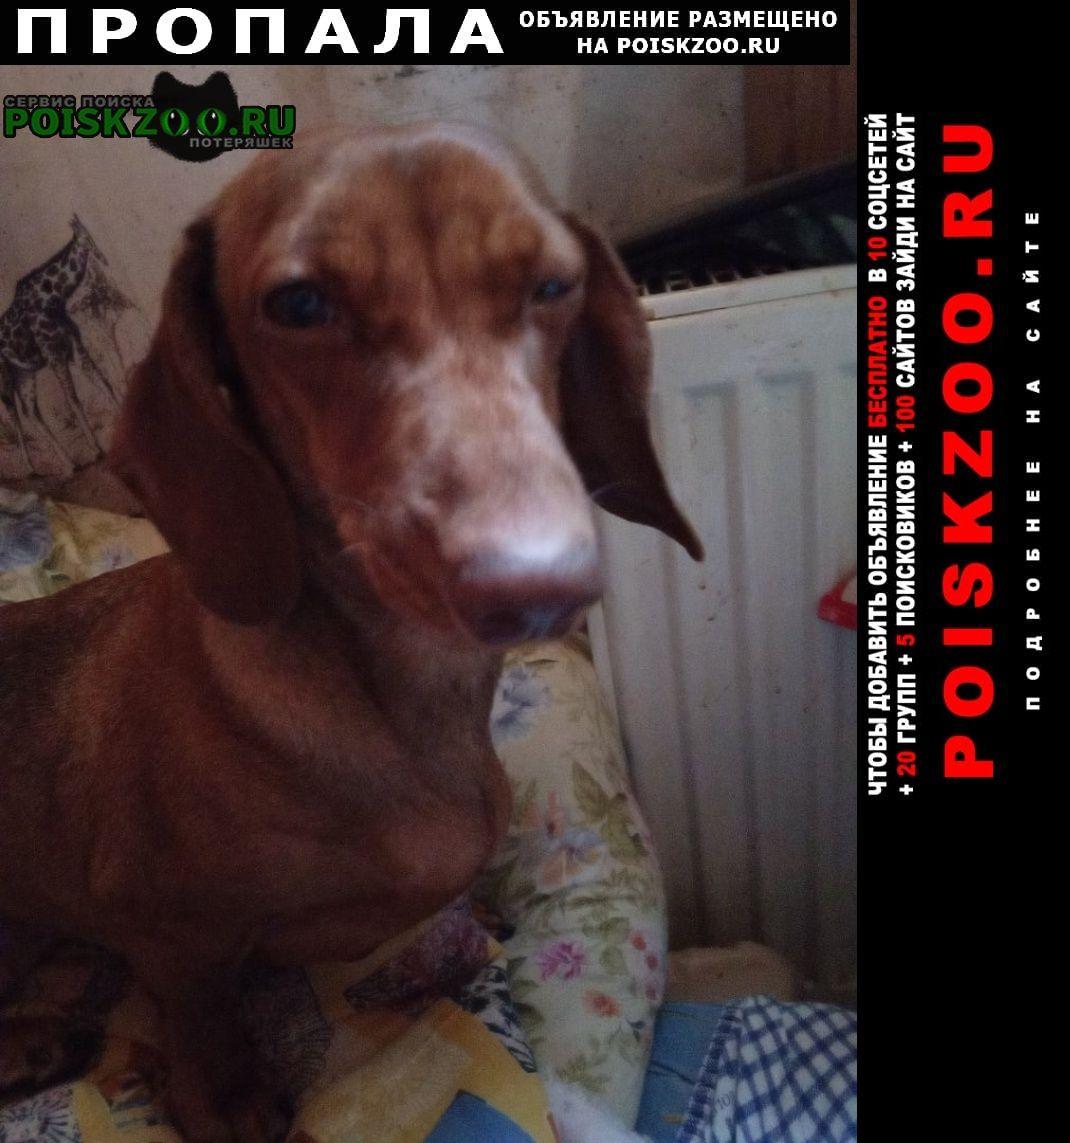 Пропала собака такса, 4 года рыжая Мытищи